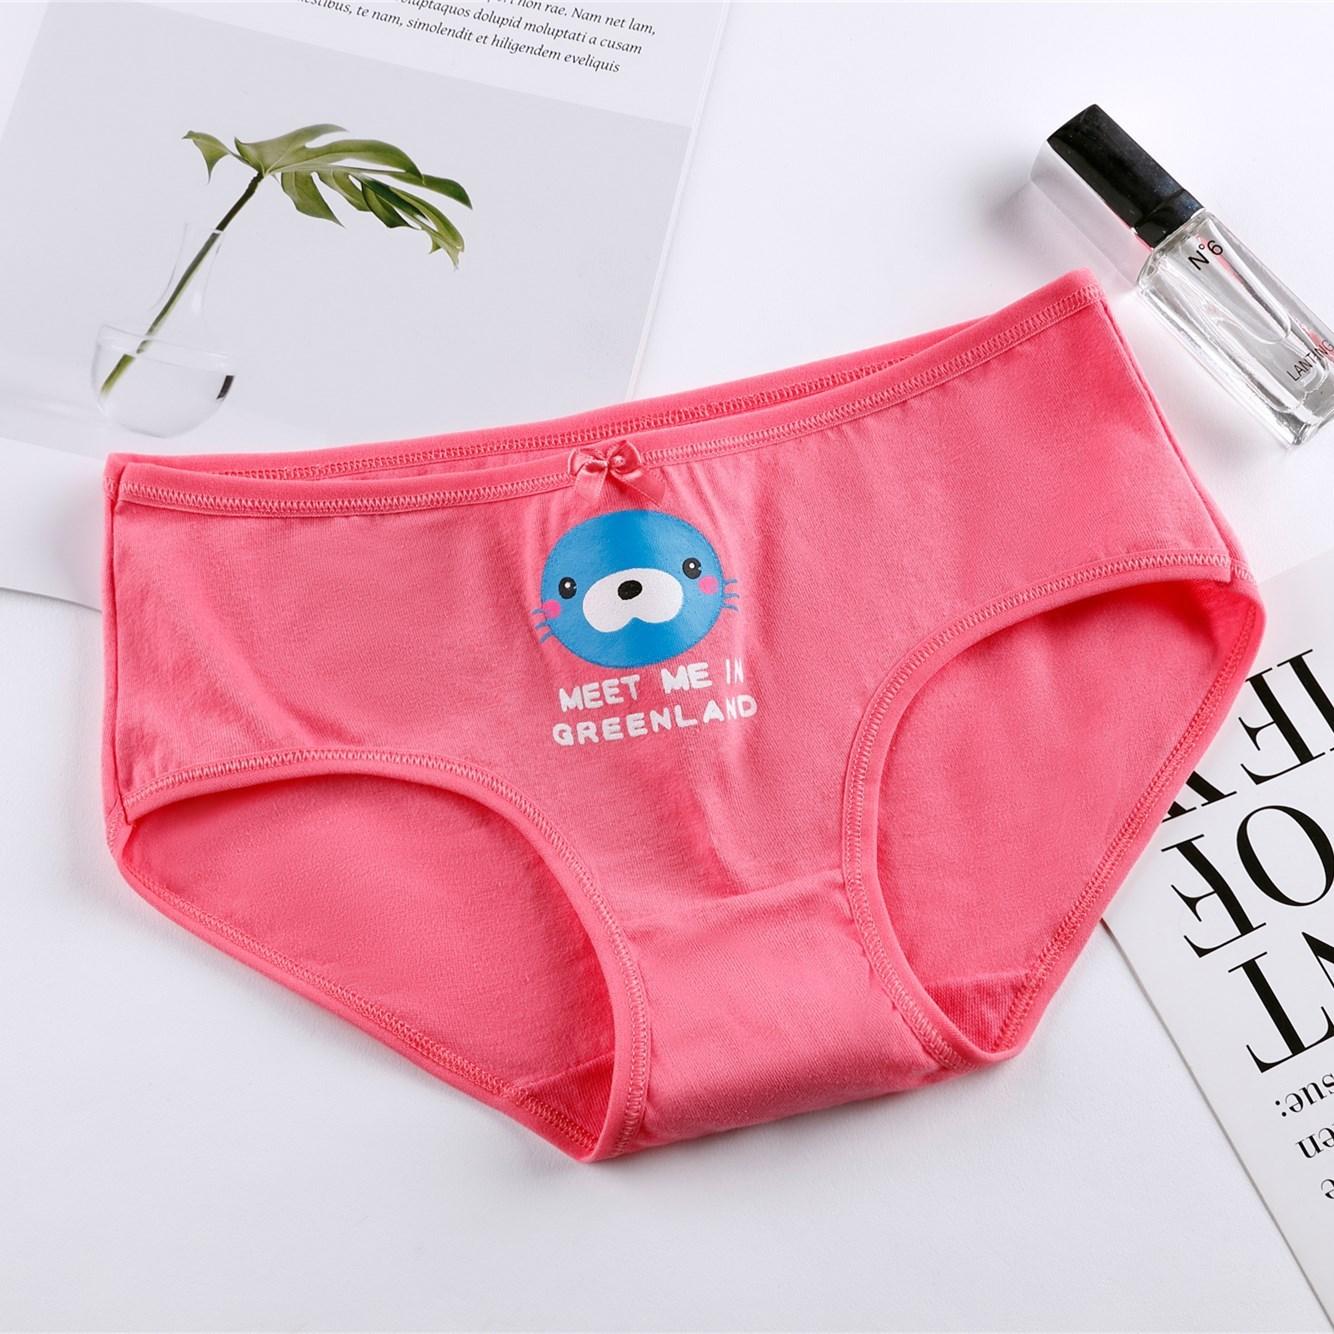 Women's panties cotton gril briefs print underwear sexy lingerie stripe underwear plus size underpants female panty pink panties